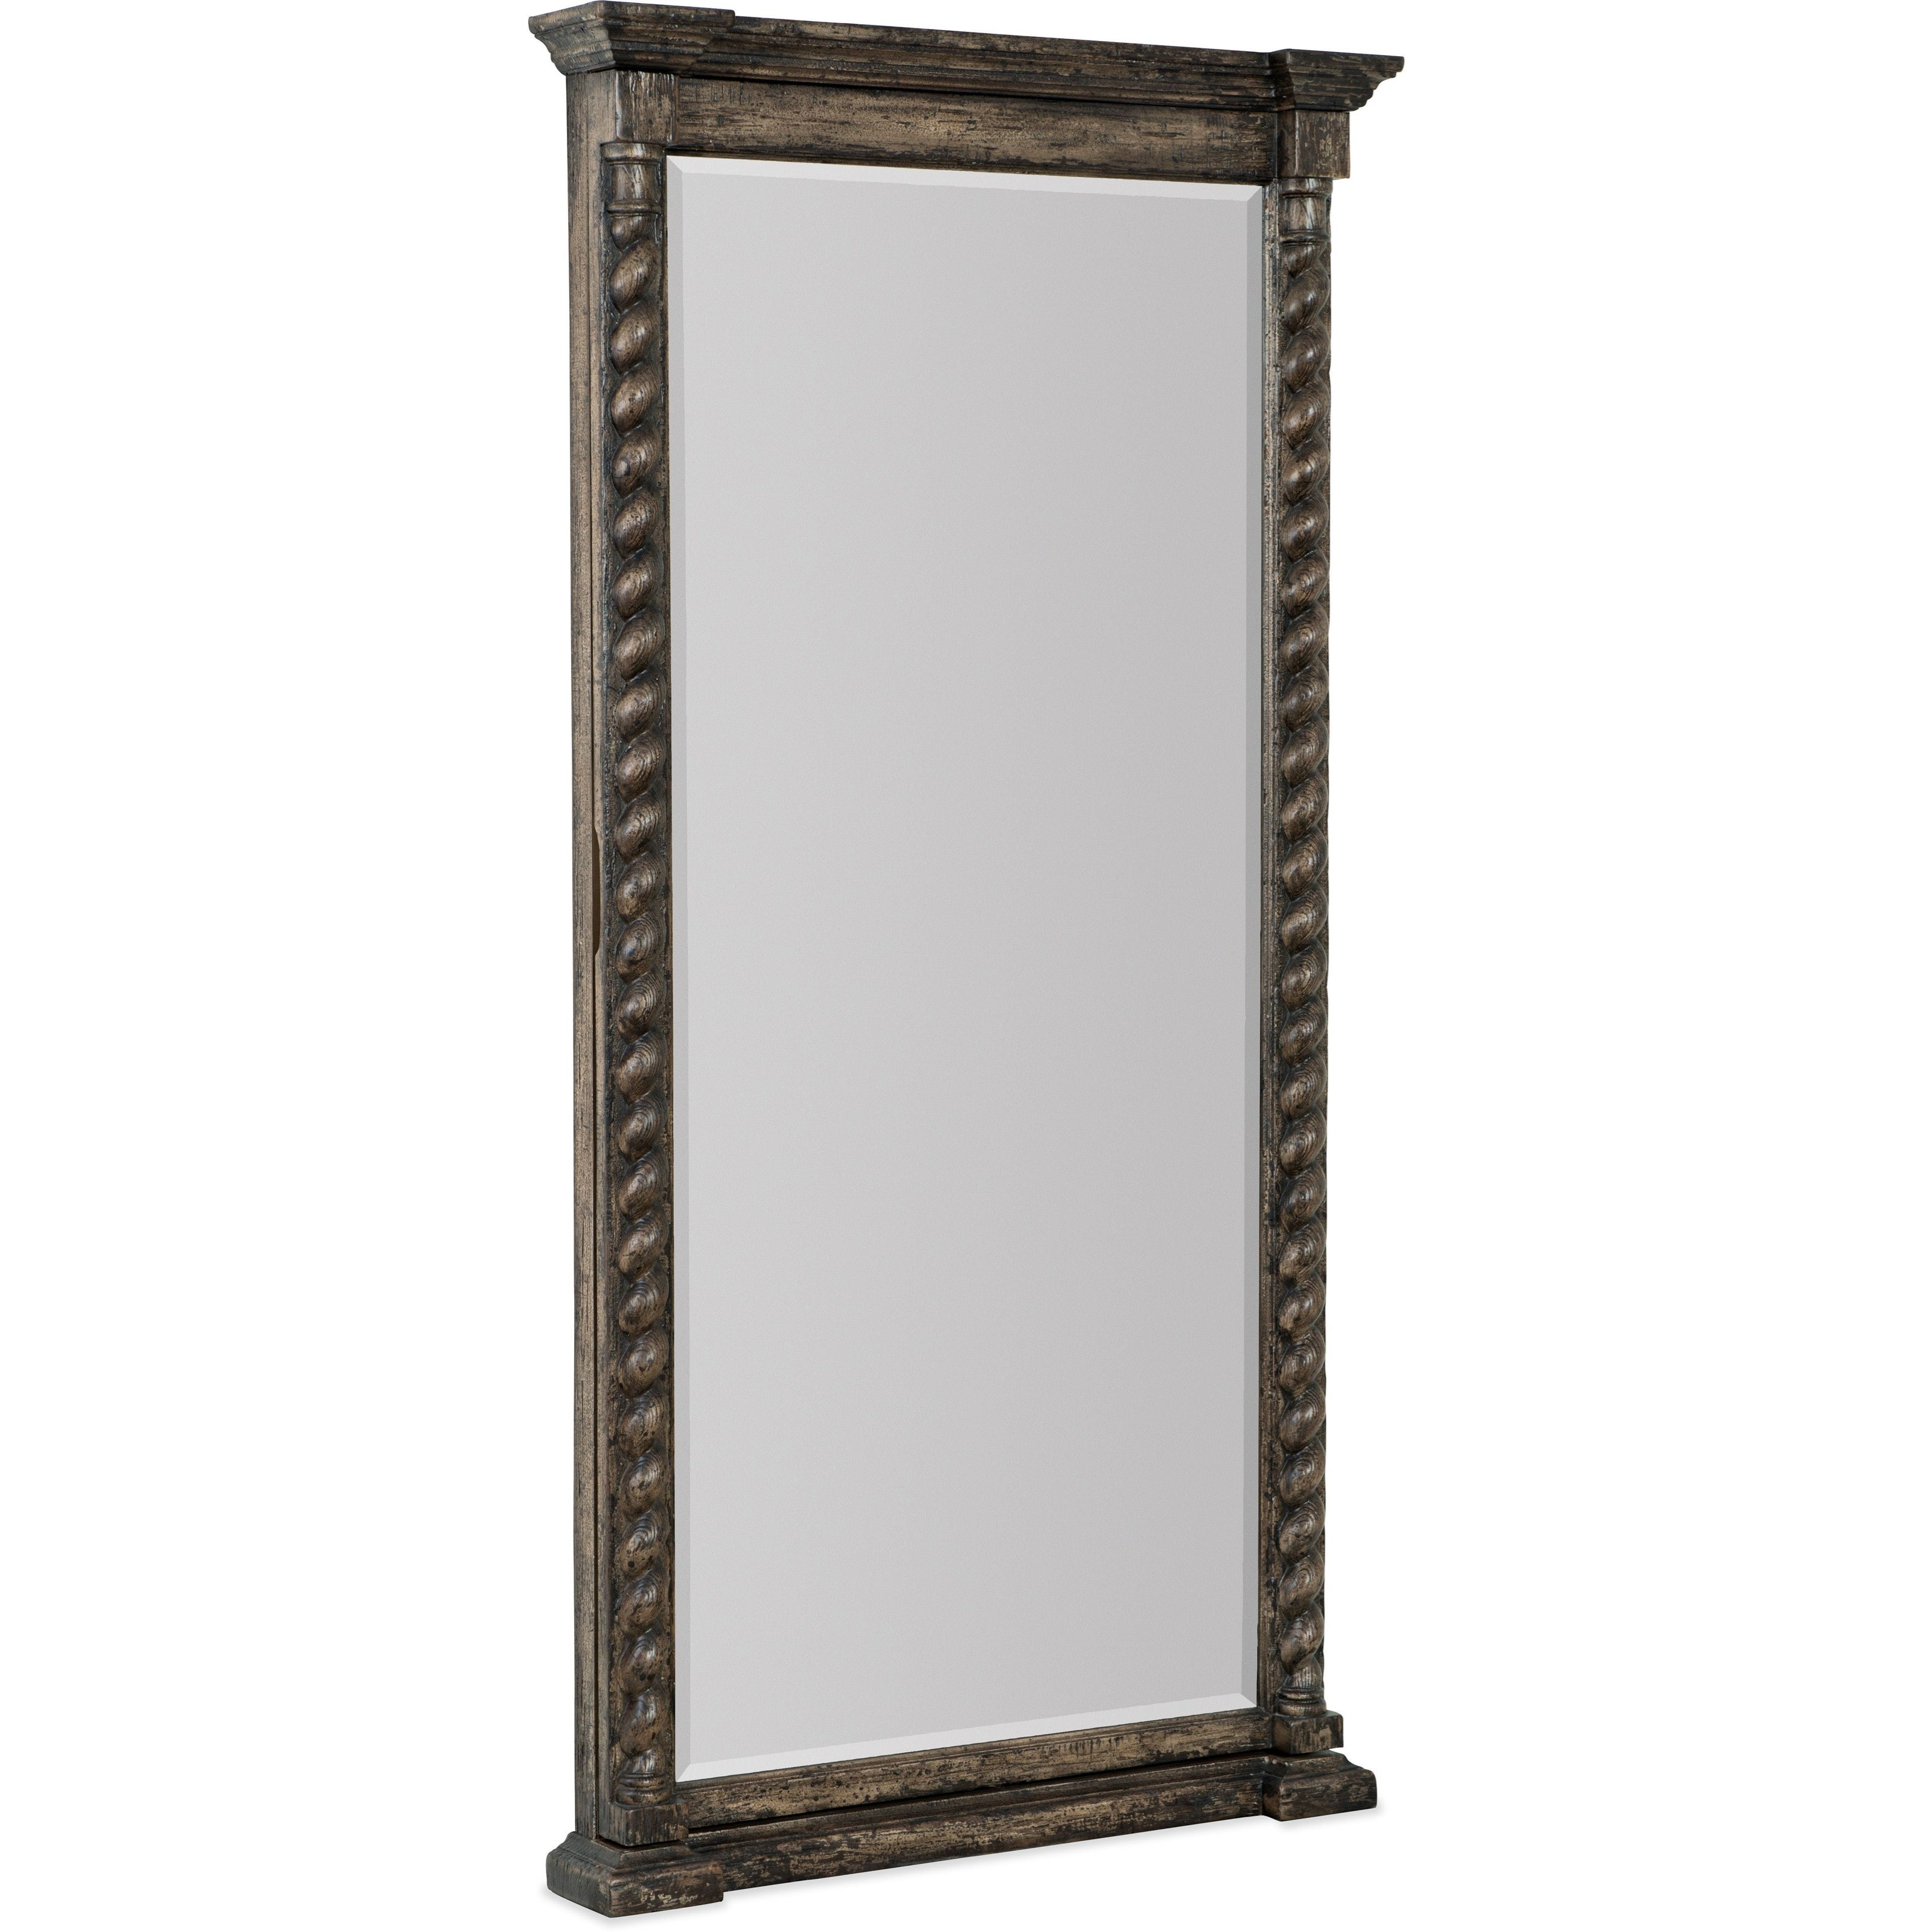 La Grange Vail Floor Mirror w/ Jewelry Storage by Hooker Furniture at Alison Craig Home Furnishings